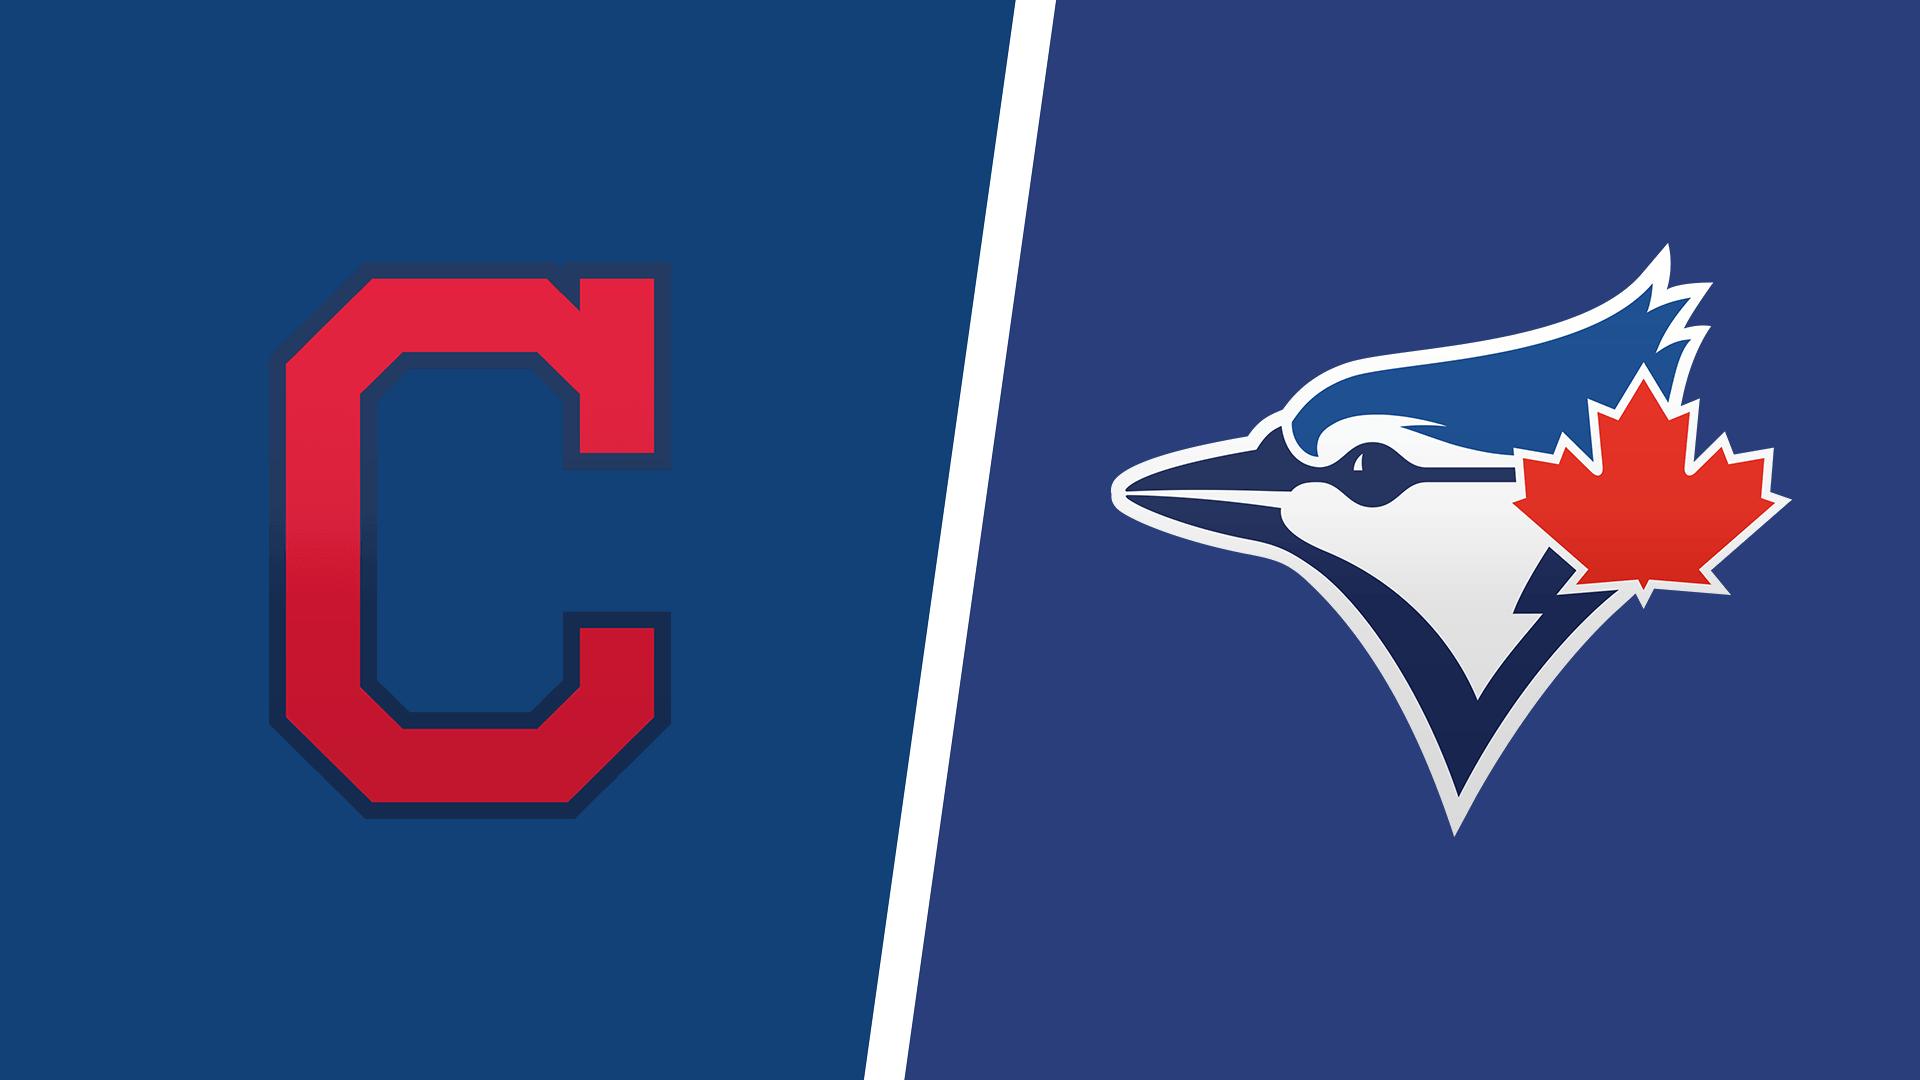 Cleveland Indians vs. Toronto Blue Jays